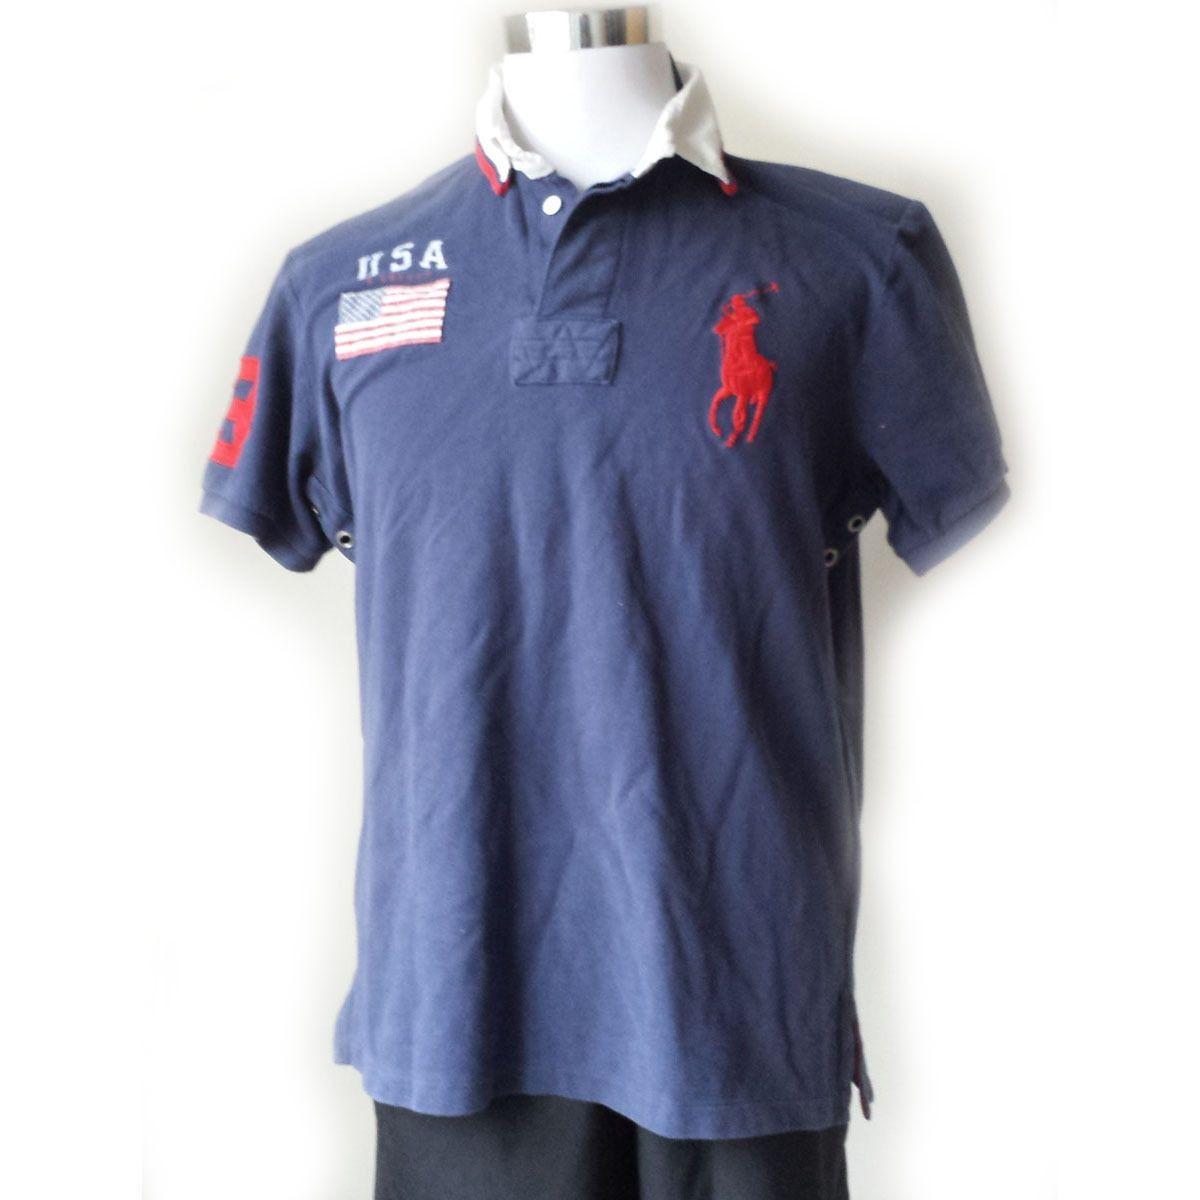 #men shirt POLO Ralph Lauren men POLO style shirt size L blue with USA flag